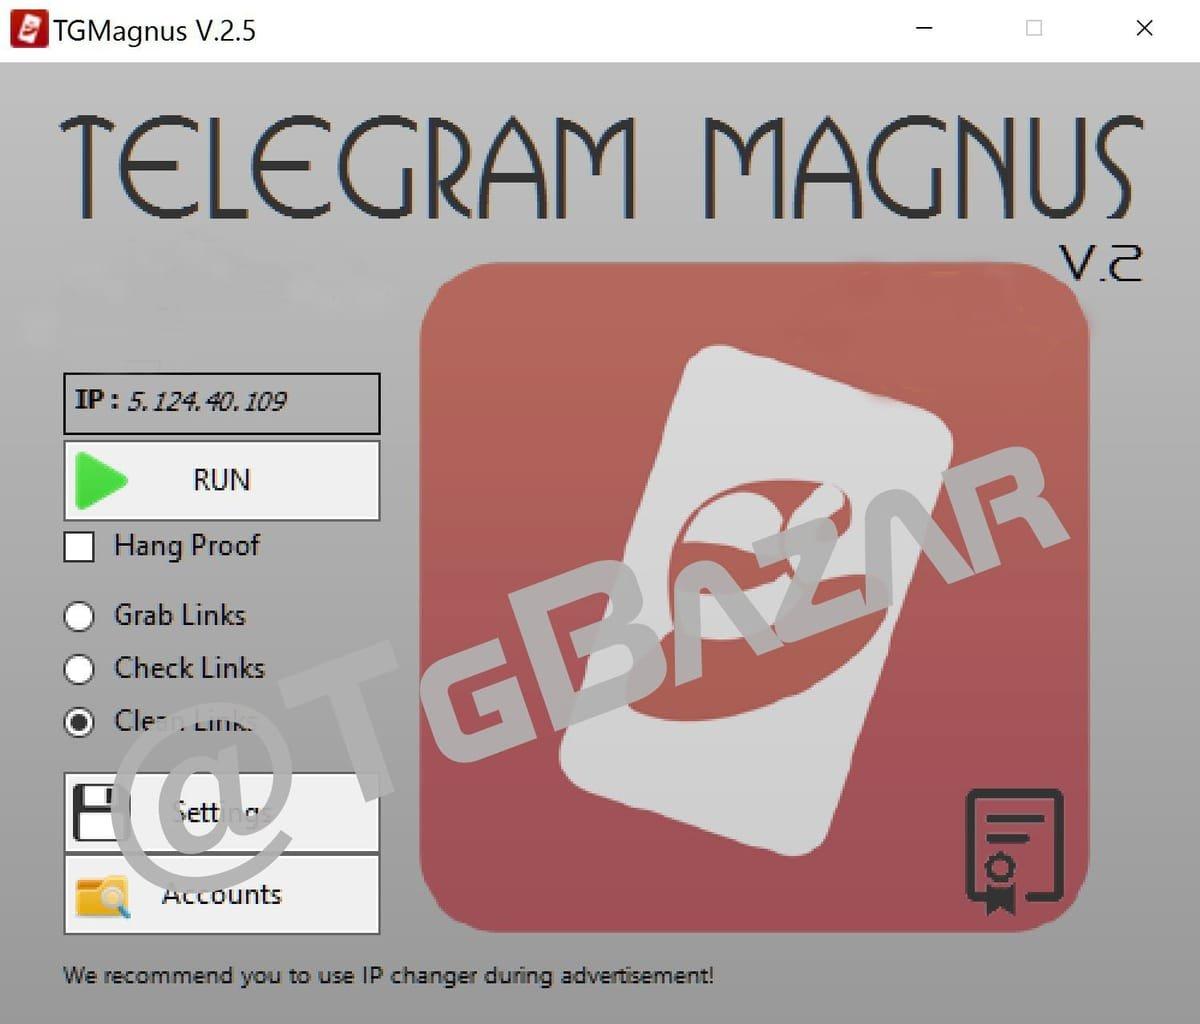 Telegram Marketing #DESI ADDA TELEGRAM CHANNEL - tgMember